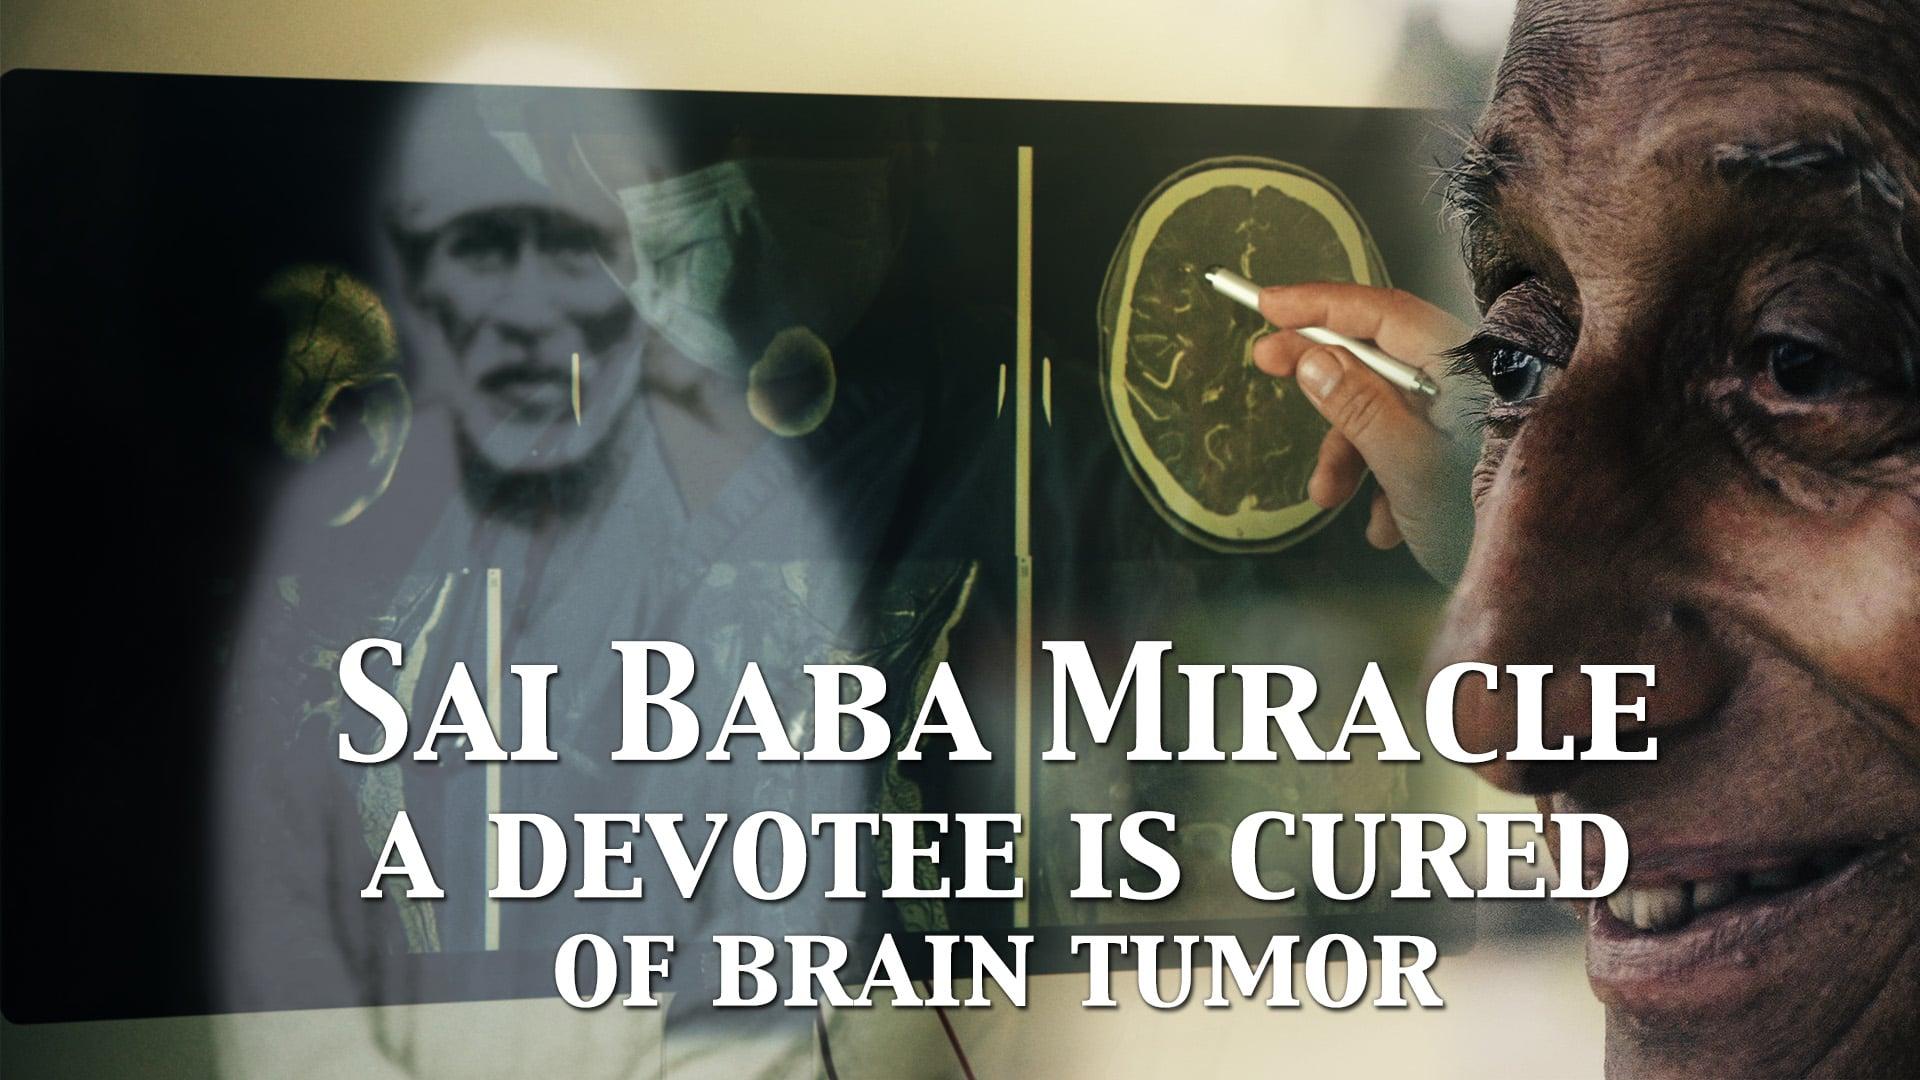 A devotee is cured of brain tumor